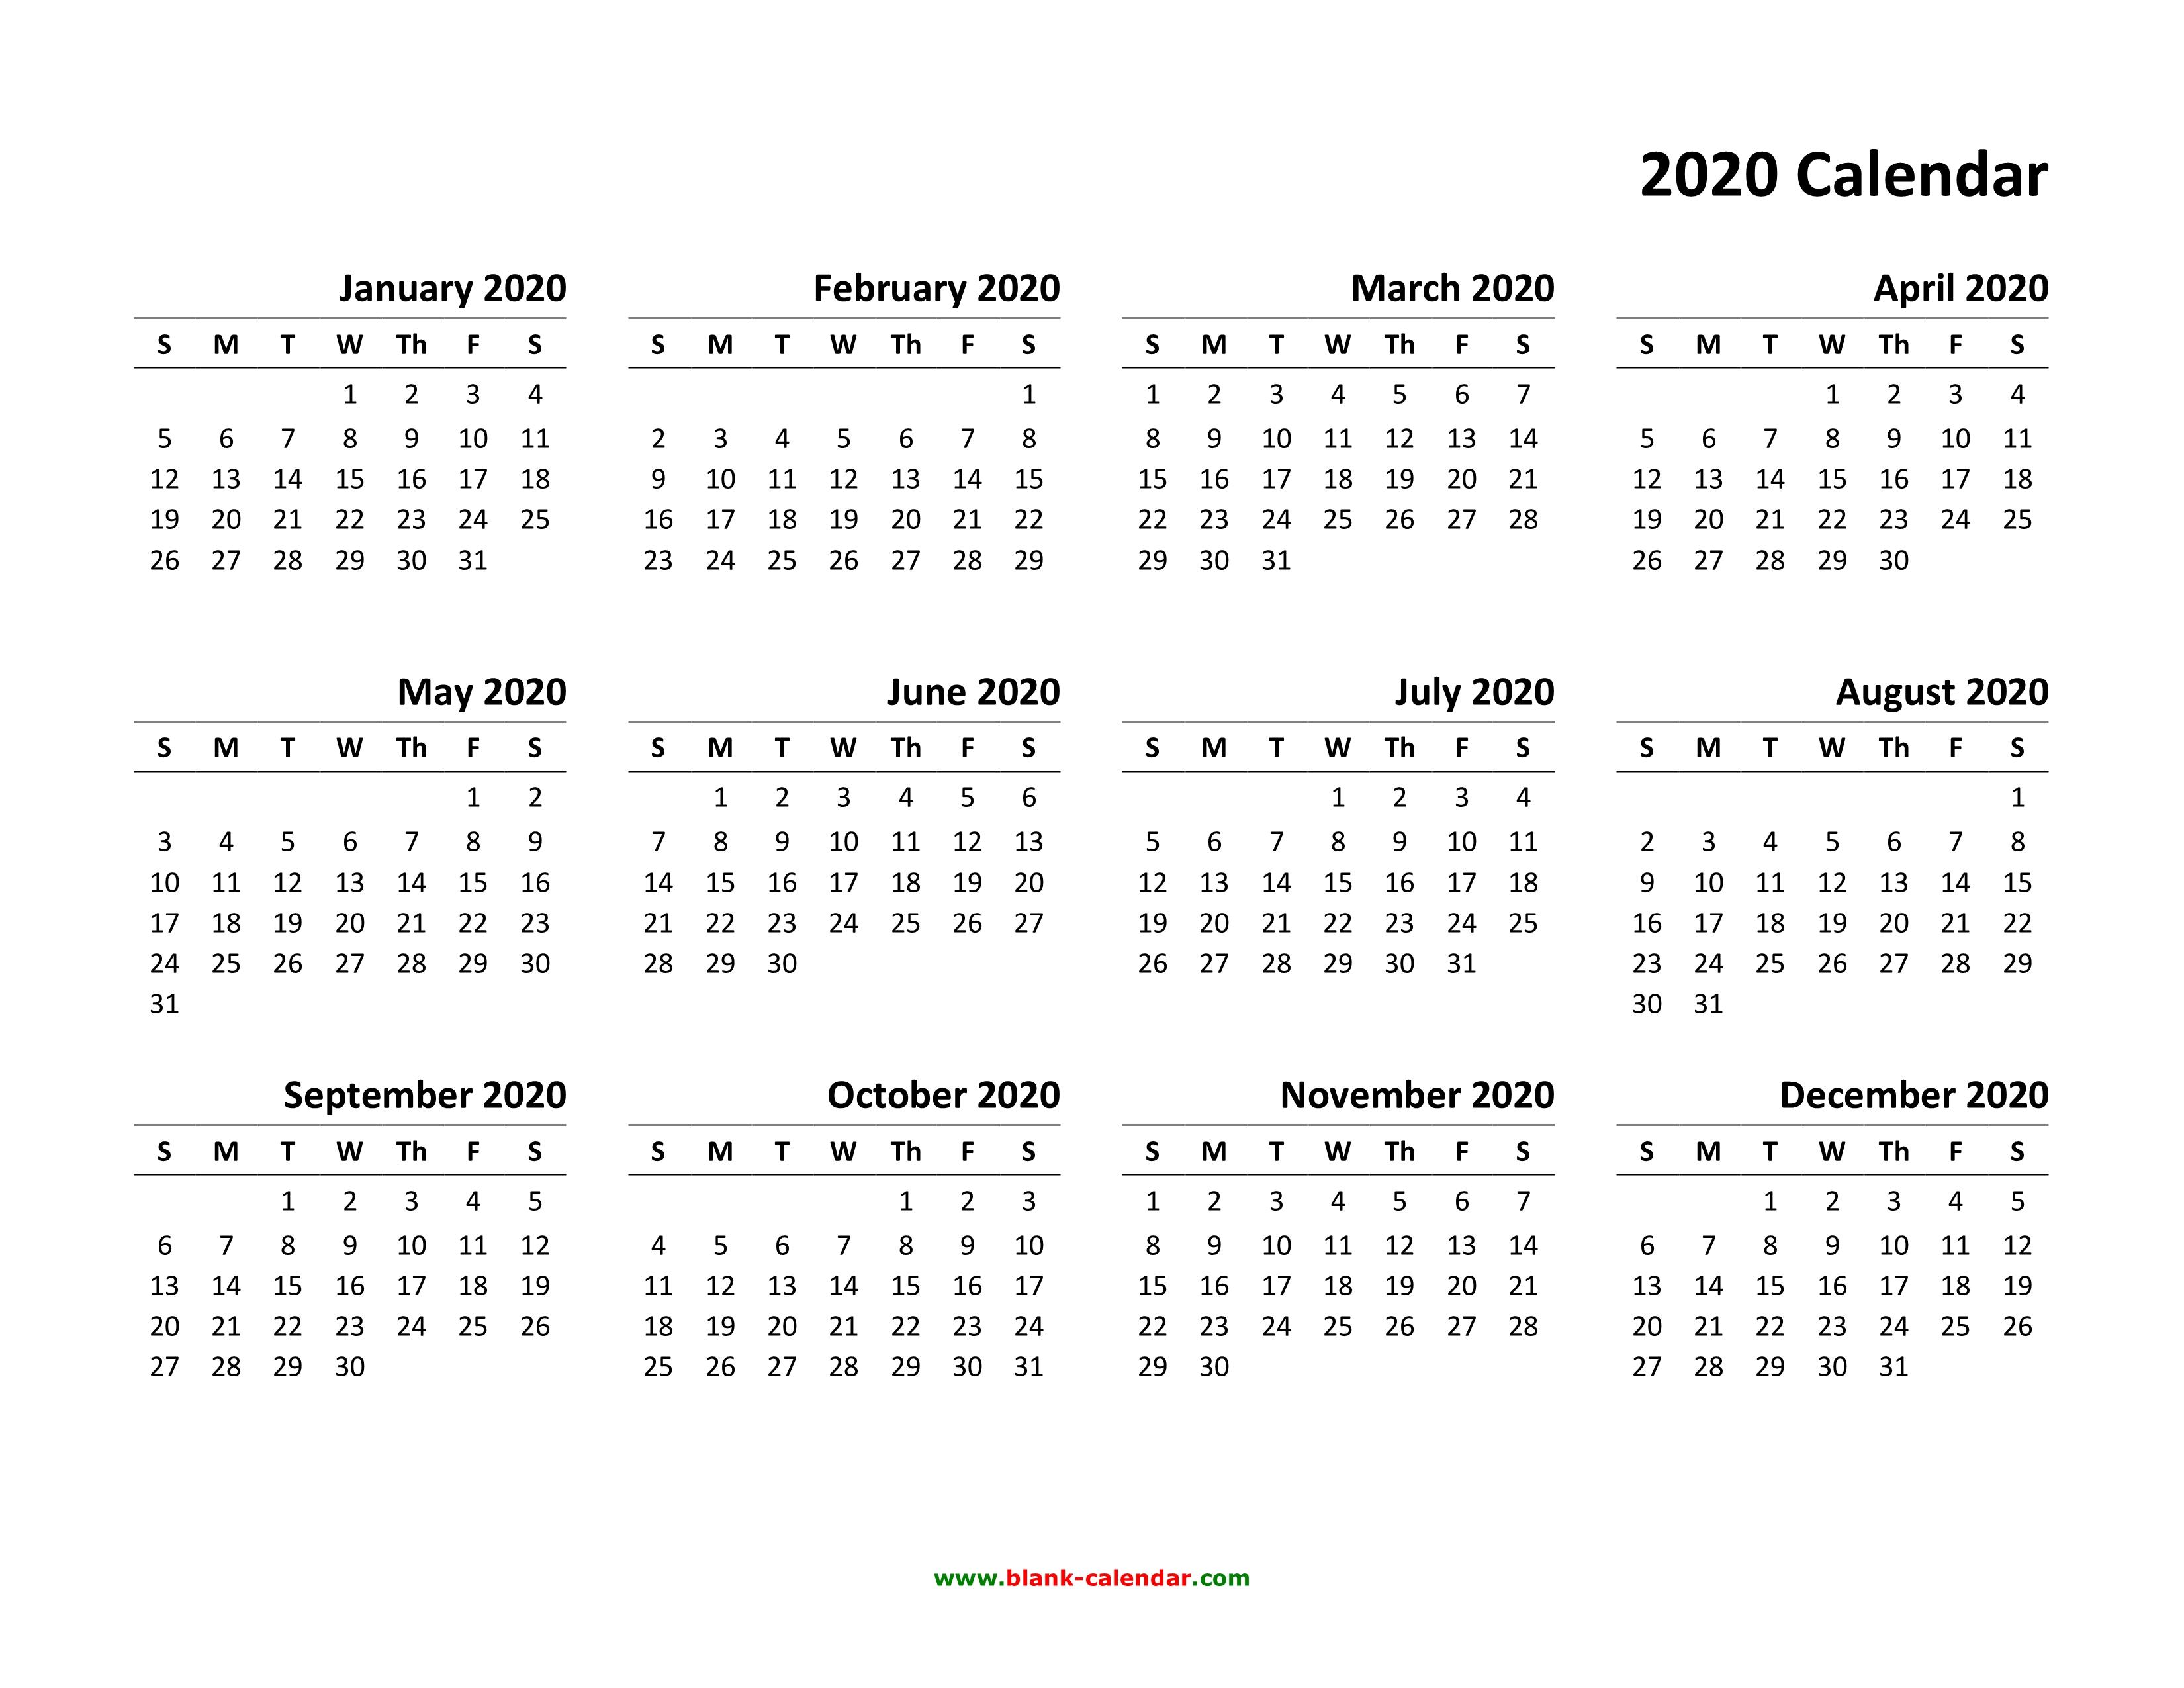 Calendar Pdf 2020 - Wpa.wpart.co